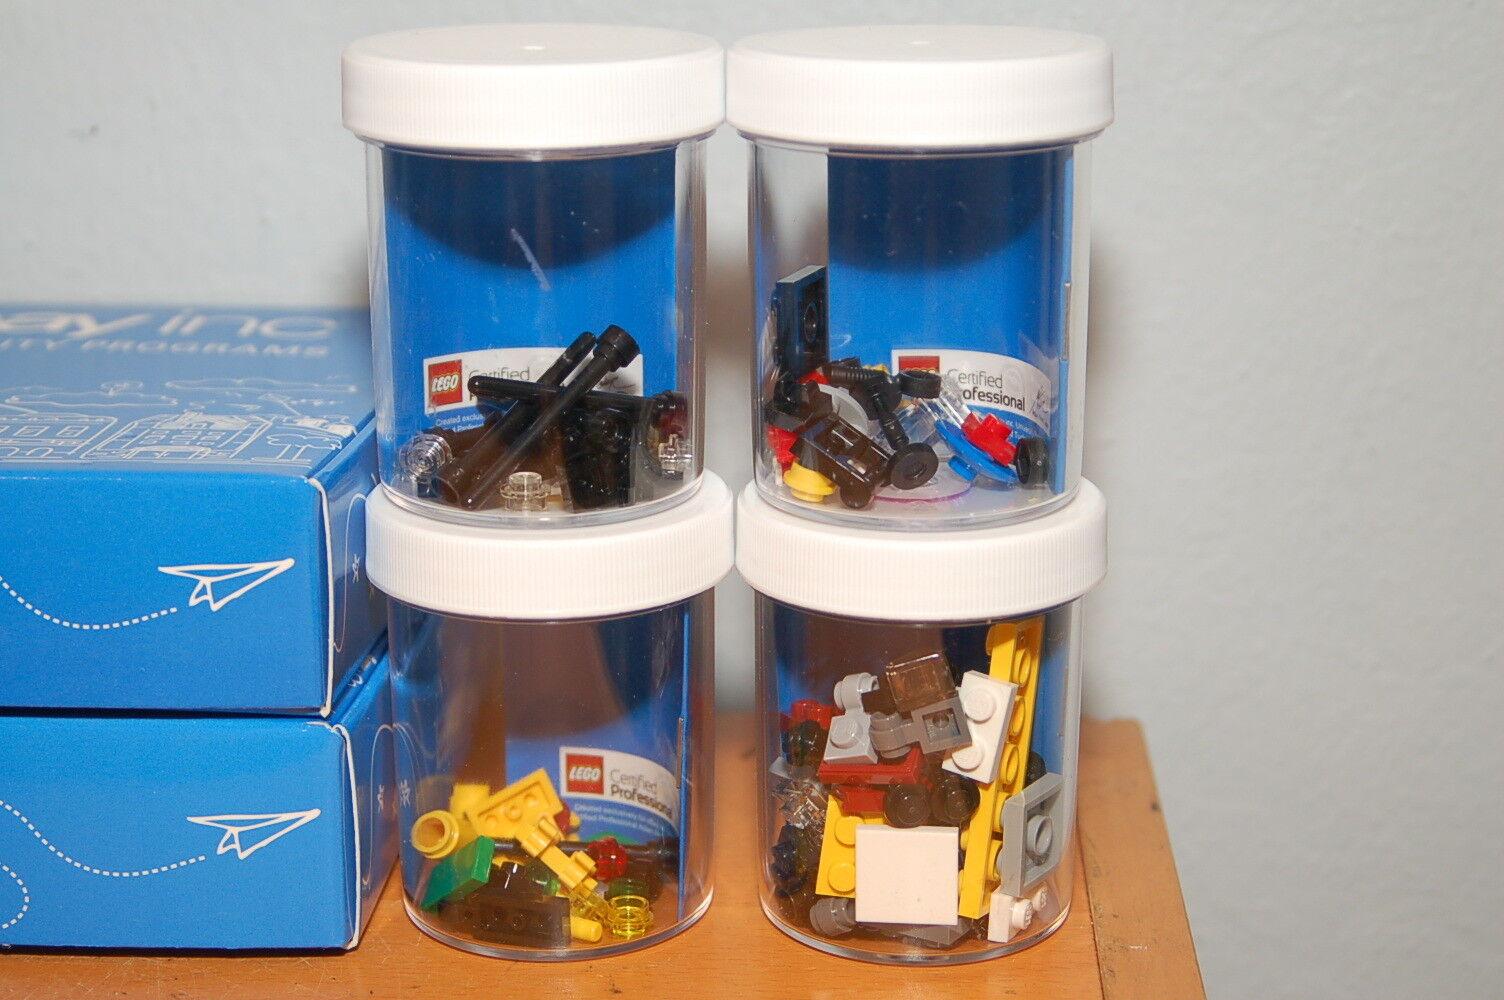 7 Lego ebay inc University Program Sets City City City Base & Graduate Cyclery Cinema etc 0bf767